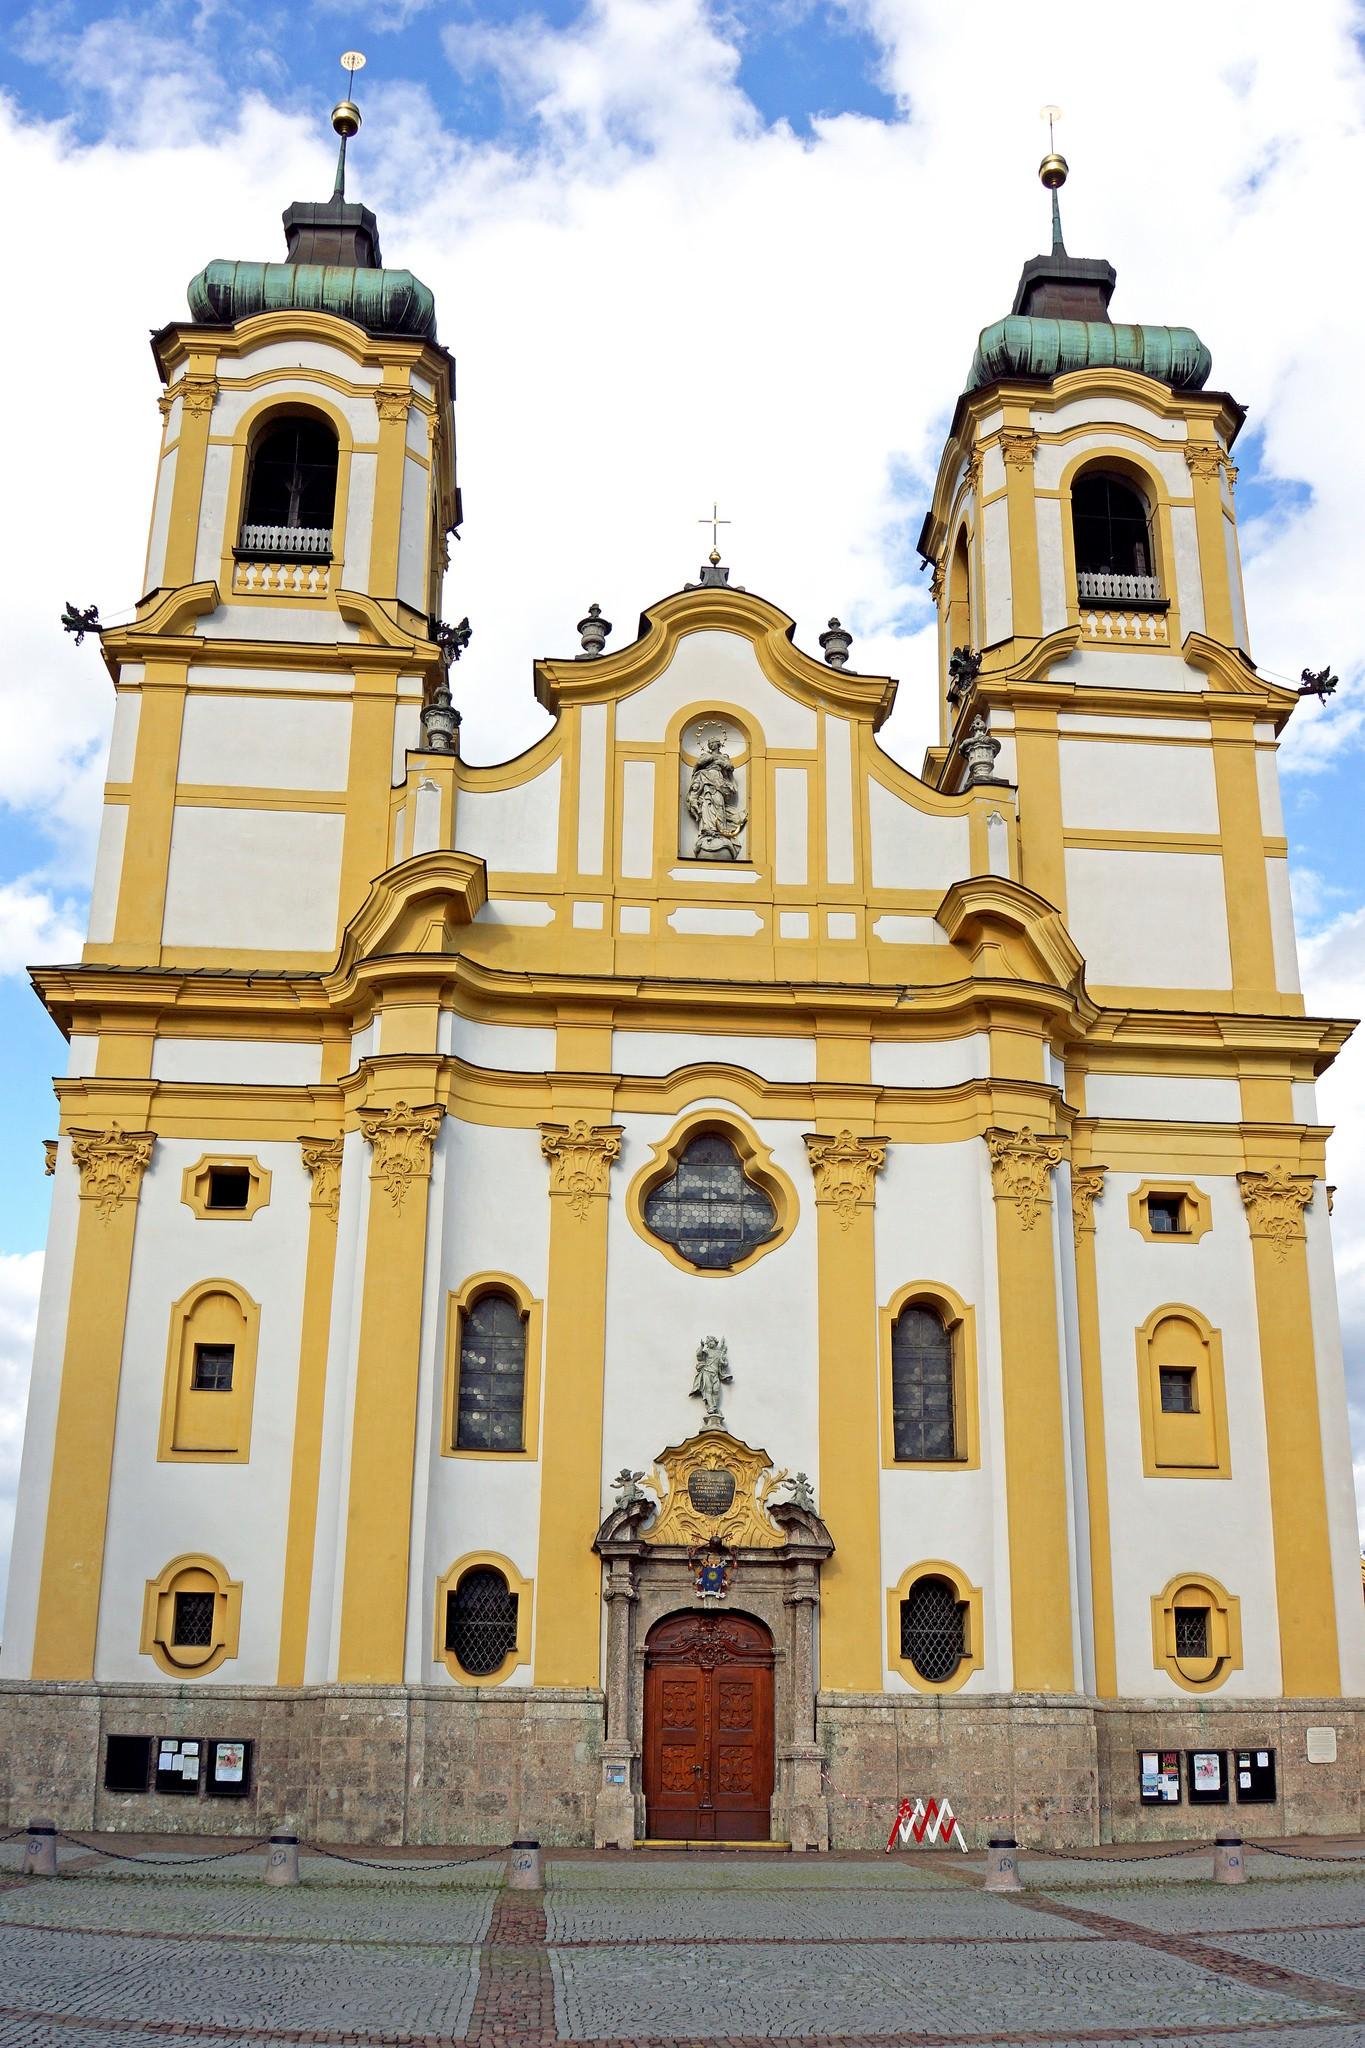 "<a href = ""https://www.flickr.com/photos/archer10/21835620470/in/photolist-zgxge1-5sNYHf-KNk81N-K1eDc8-KSSyoz-KQTAgc-KvsL1L-K1eD9x""> Austria-01450 - Wilten Basilica | © Dennis Jarvis/Flickr"